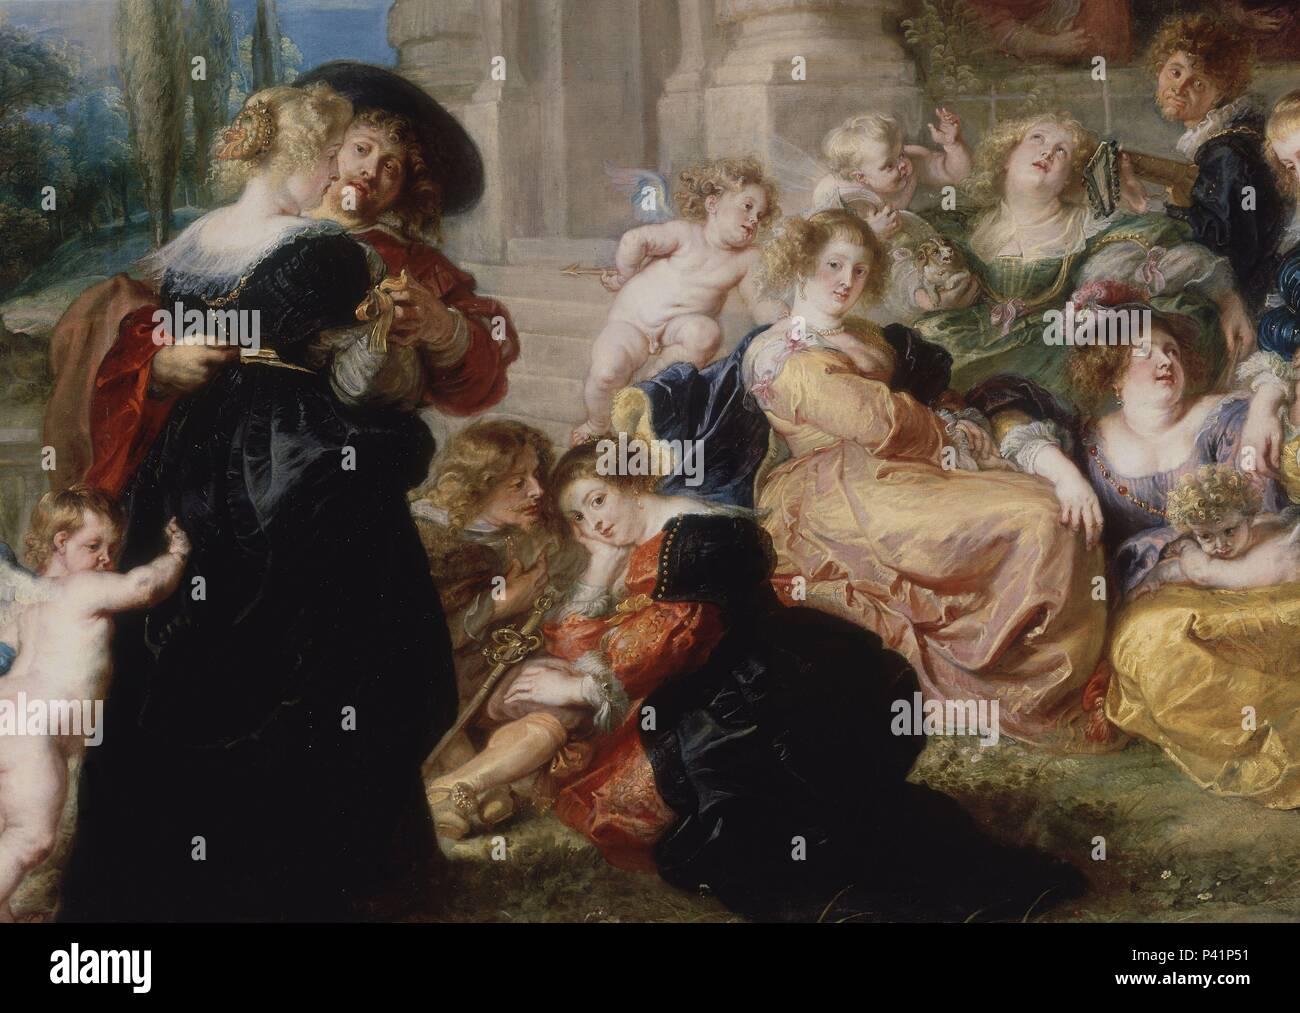 The Garden of Love\' (detail), 1633-1634, Flemish Baroque, Oil on ...